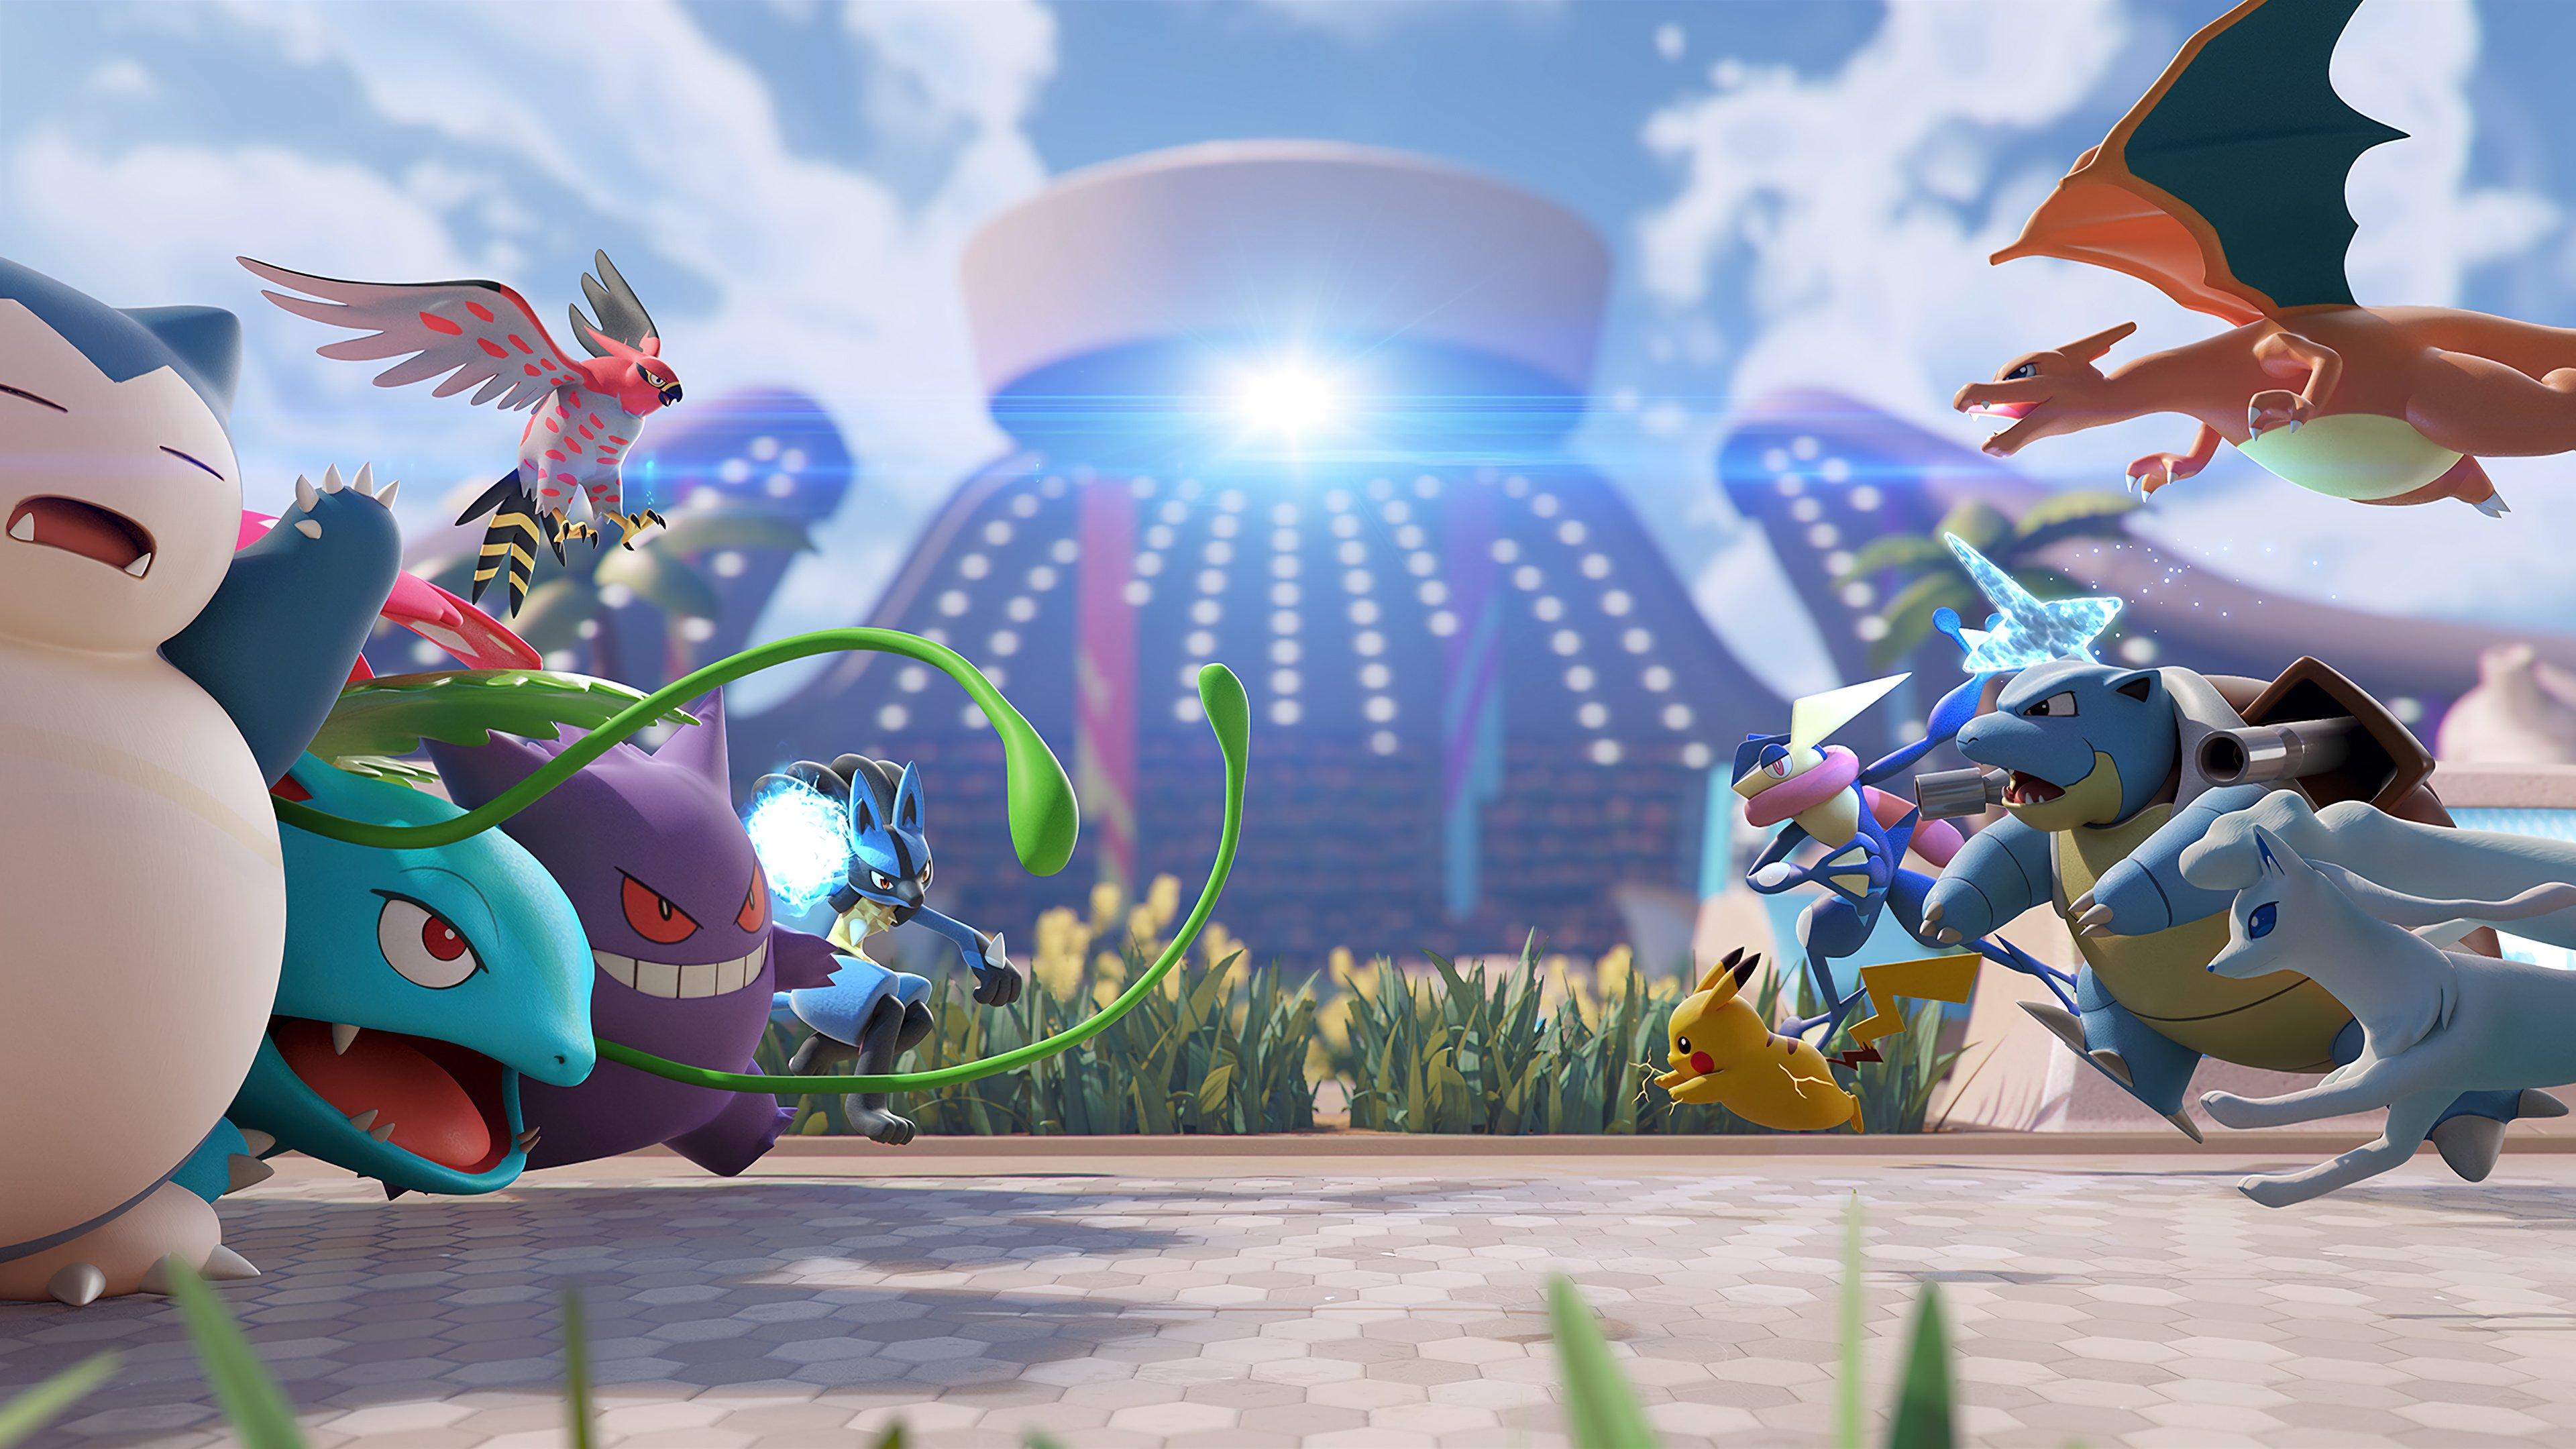 Wallpaper Pokemon Unite